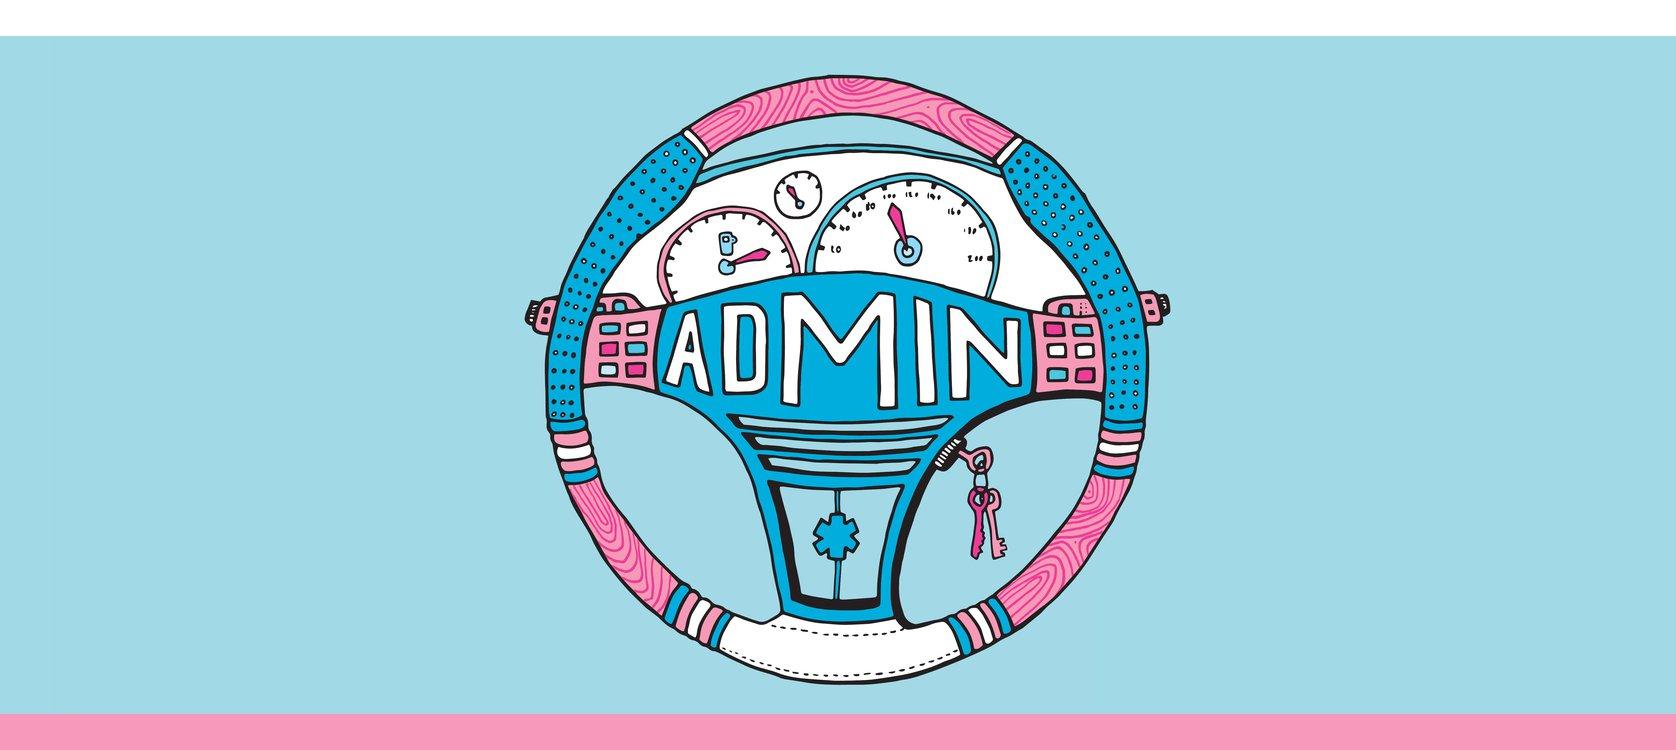 Admin Group Banner Image